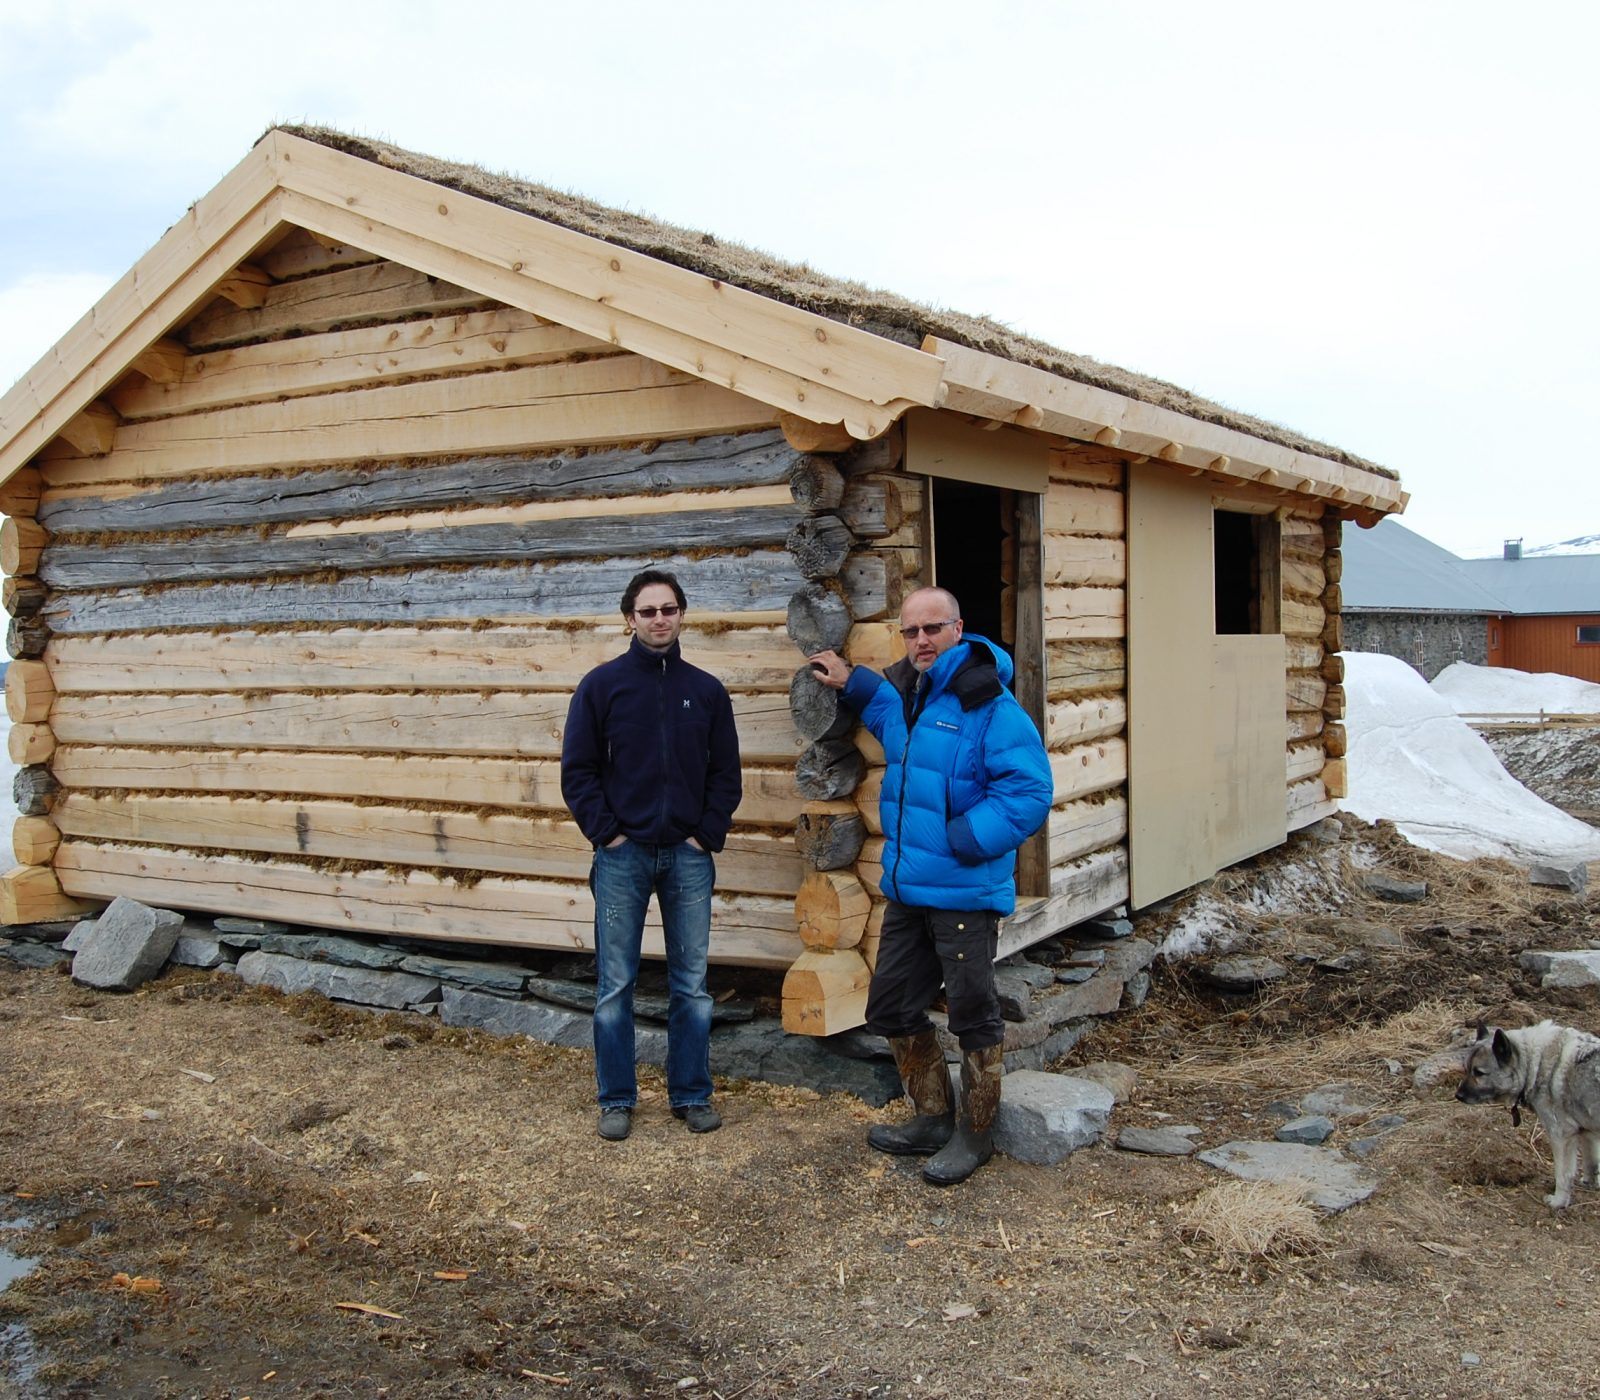 Eierne under istandsettingsarbeidet av Karstugu på Fokstugu fjellstue. (Foto: Einar Engen/Kulturminnefondet)